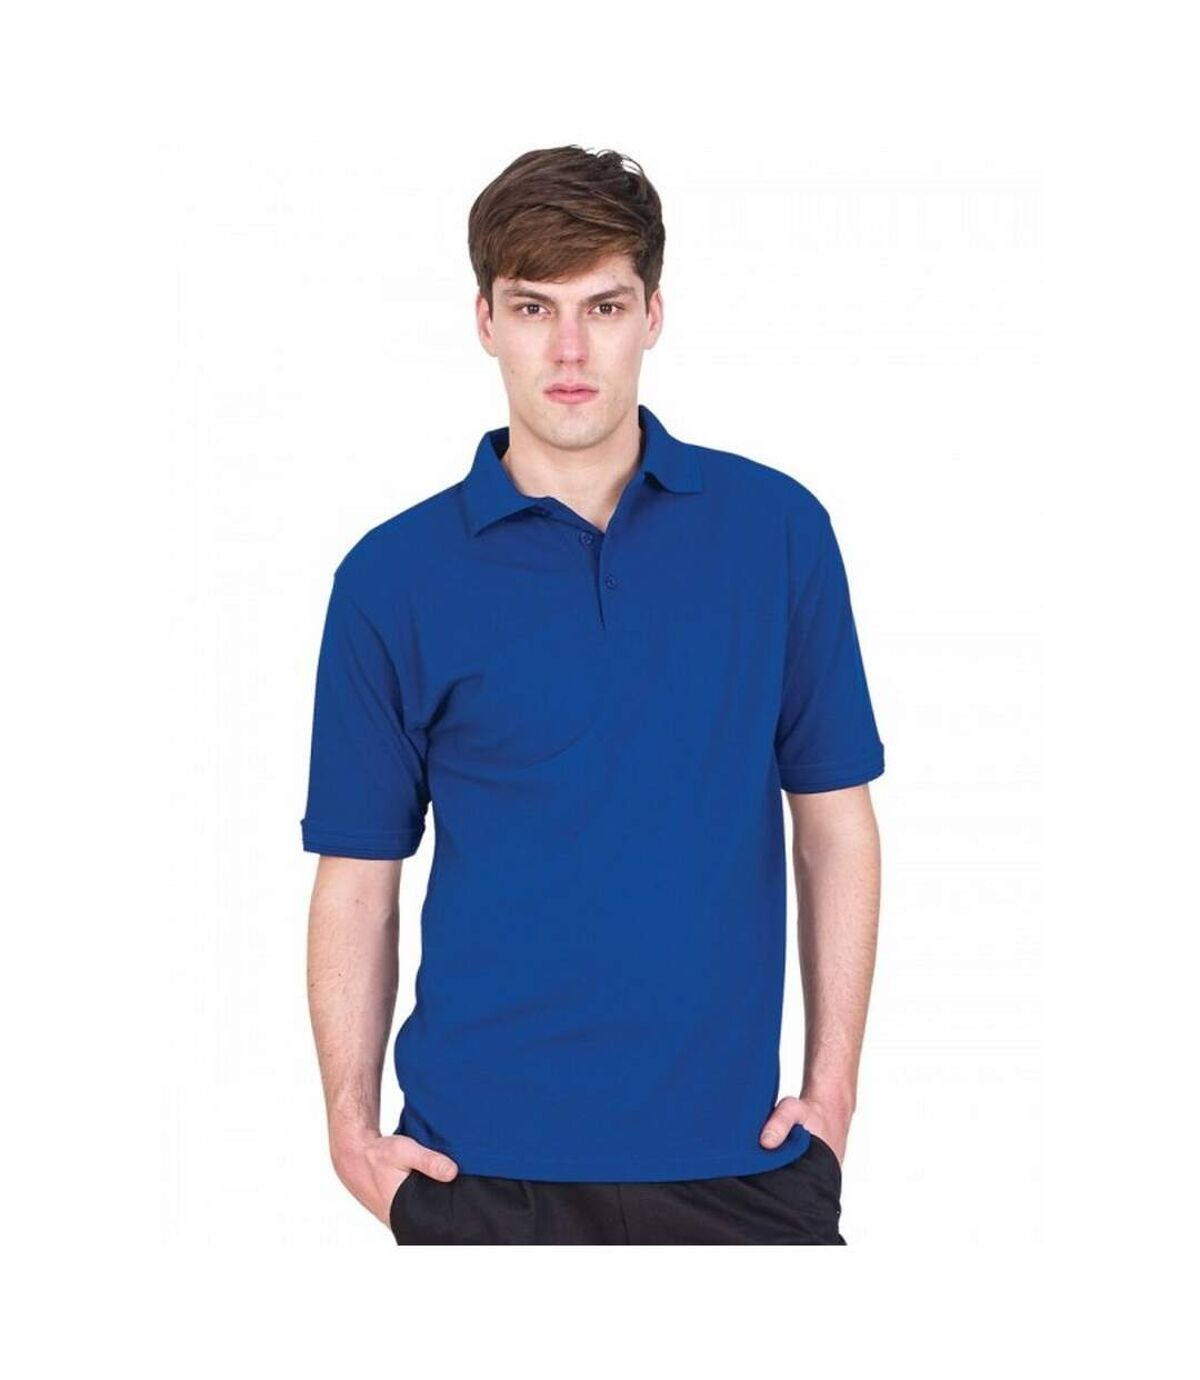 UCC 50/50 Mens Heavyweight Plain Pique Short Sleeve Polo Shirt (Royal) - UTBC1195